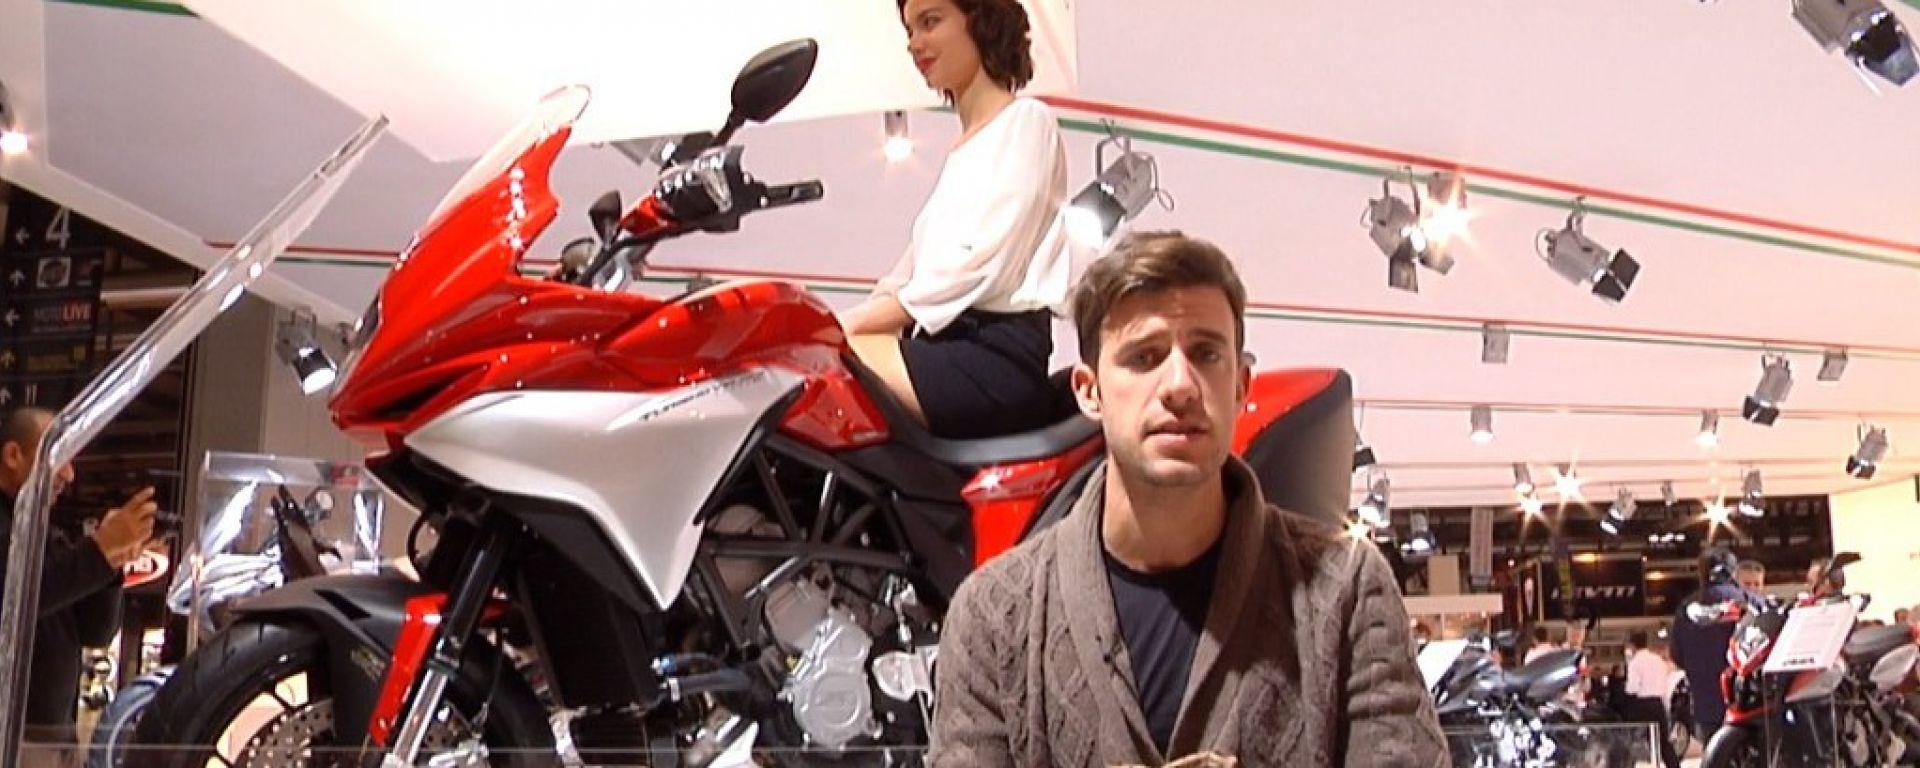 Eicma 2013, lo stand MV Agusta